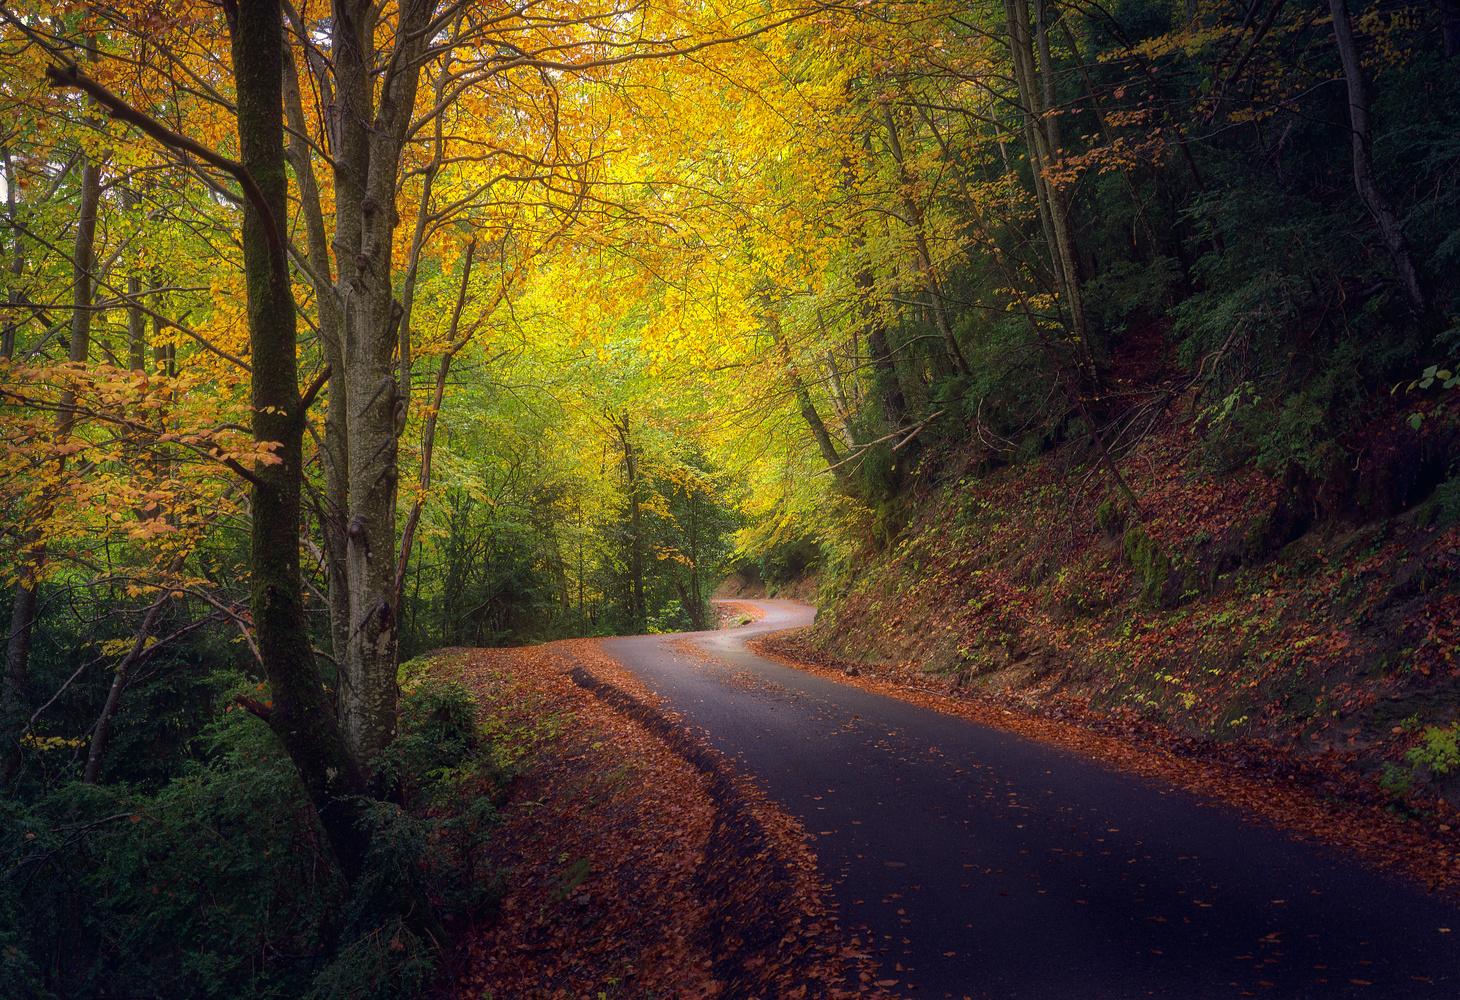 Autumnal Curves by Ricardo Gayan